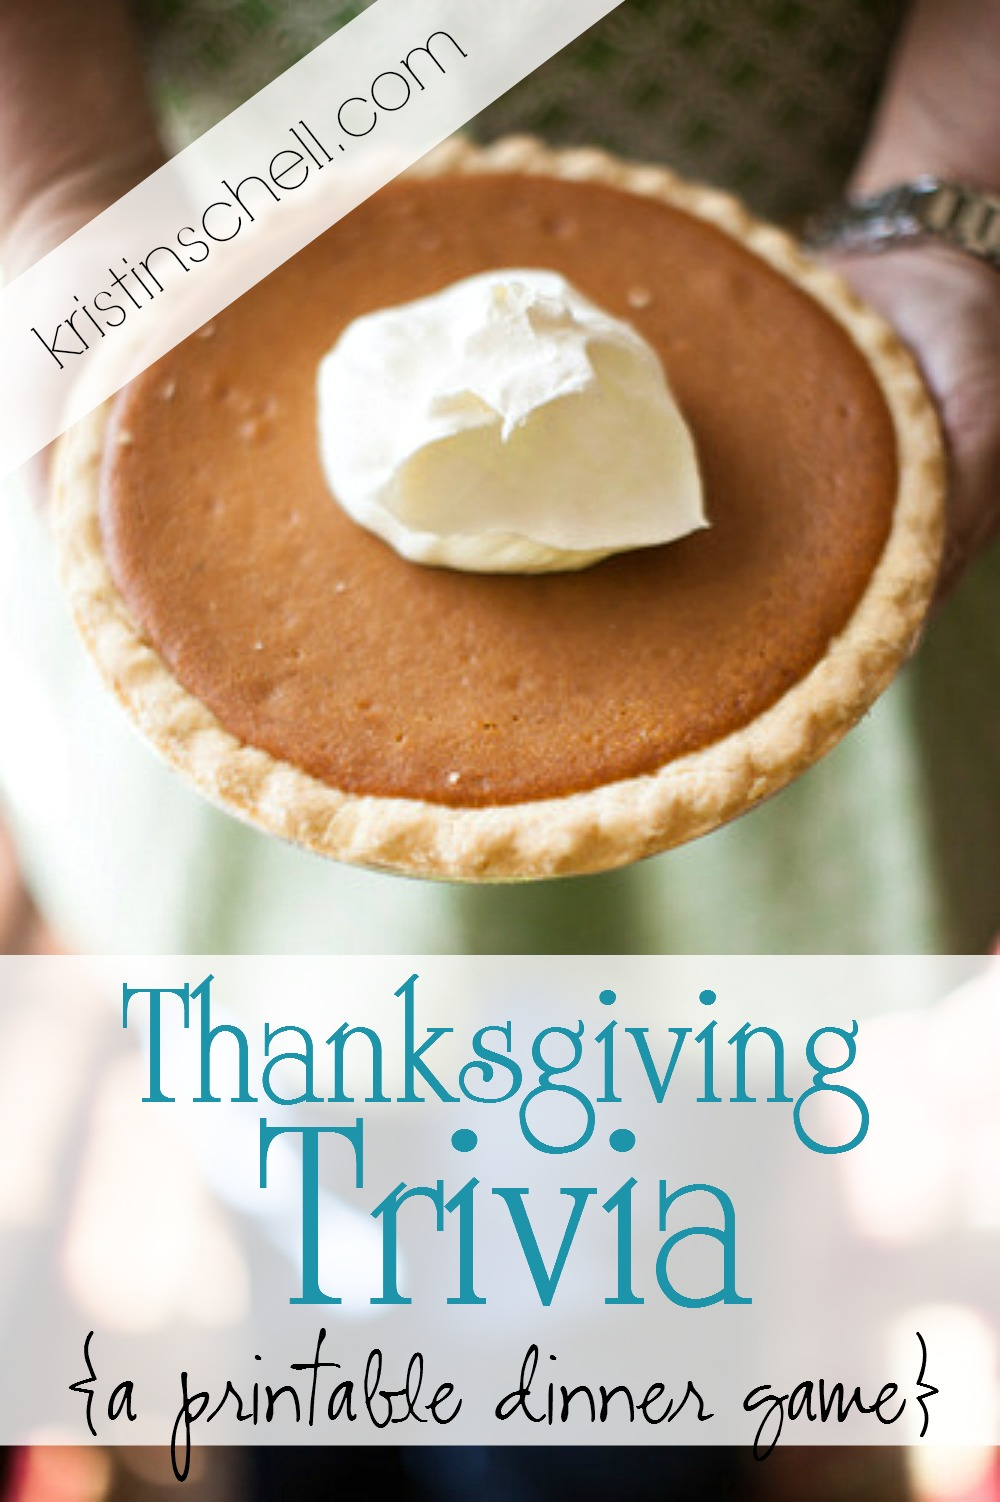 Thanksgiving Trivia - a printable dinner game